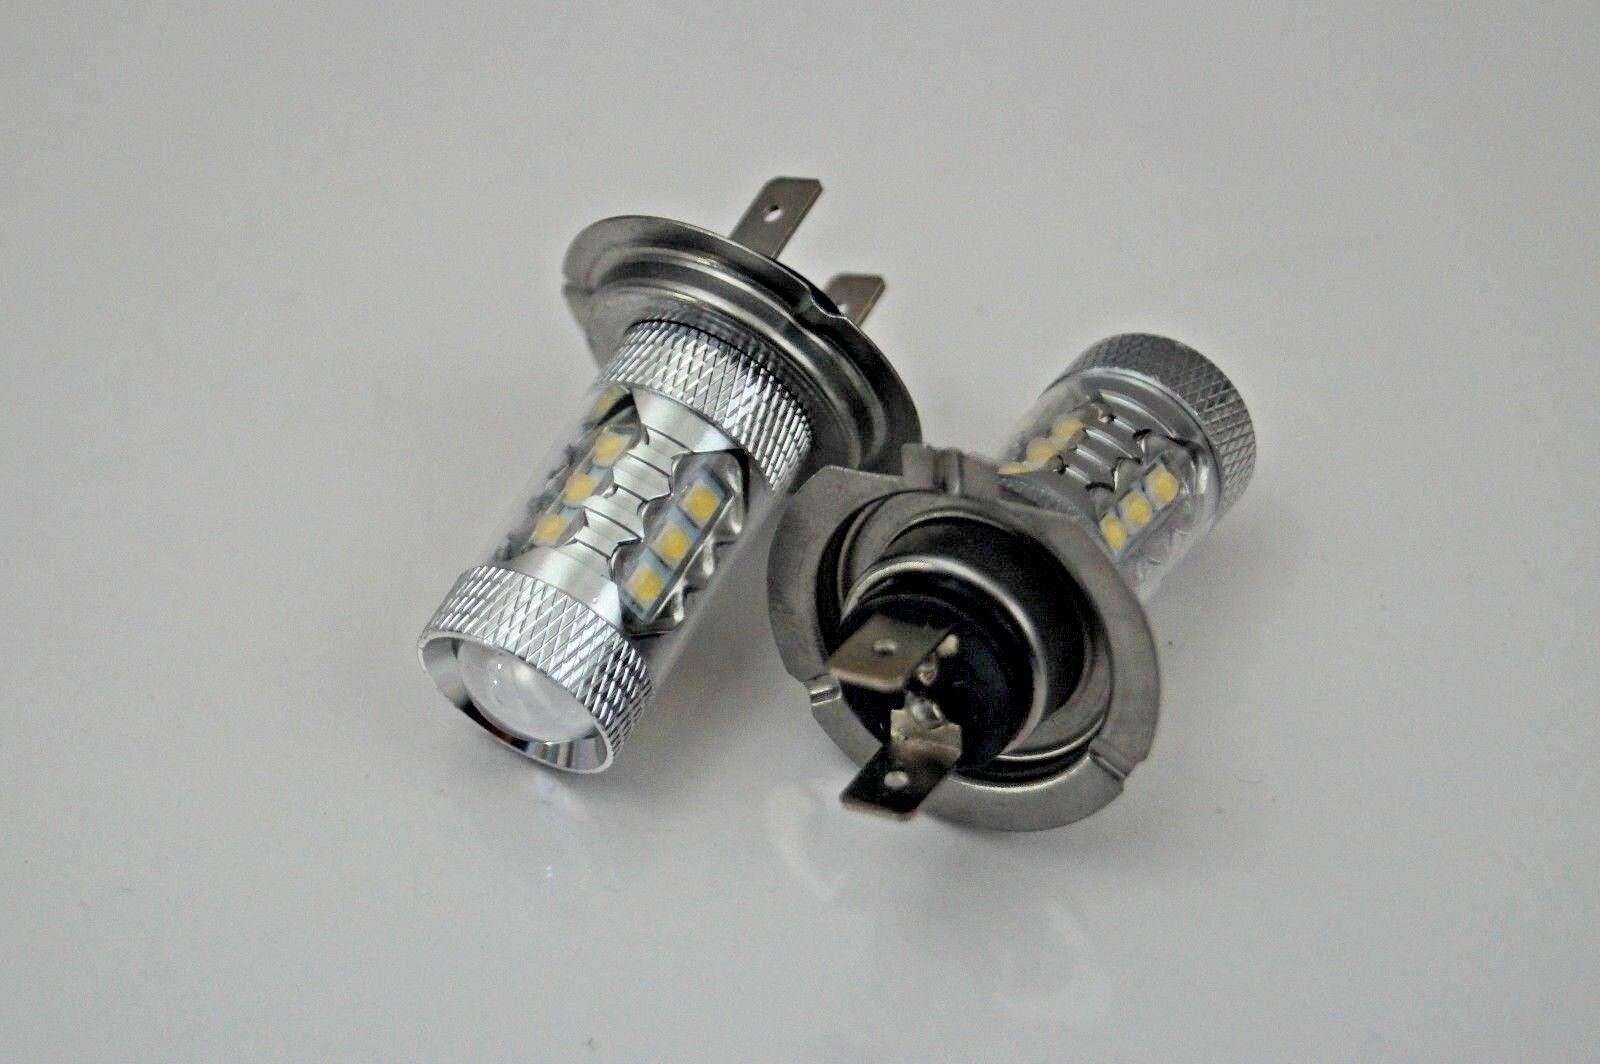 VW GOLF MK4 97-06 SET 2x H7 CREE 16 LED HEADLIGHT BULBS FOG LIGHTS BEST QUALITY